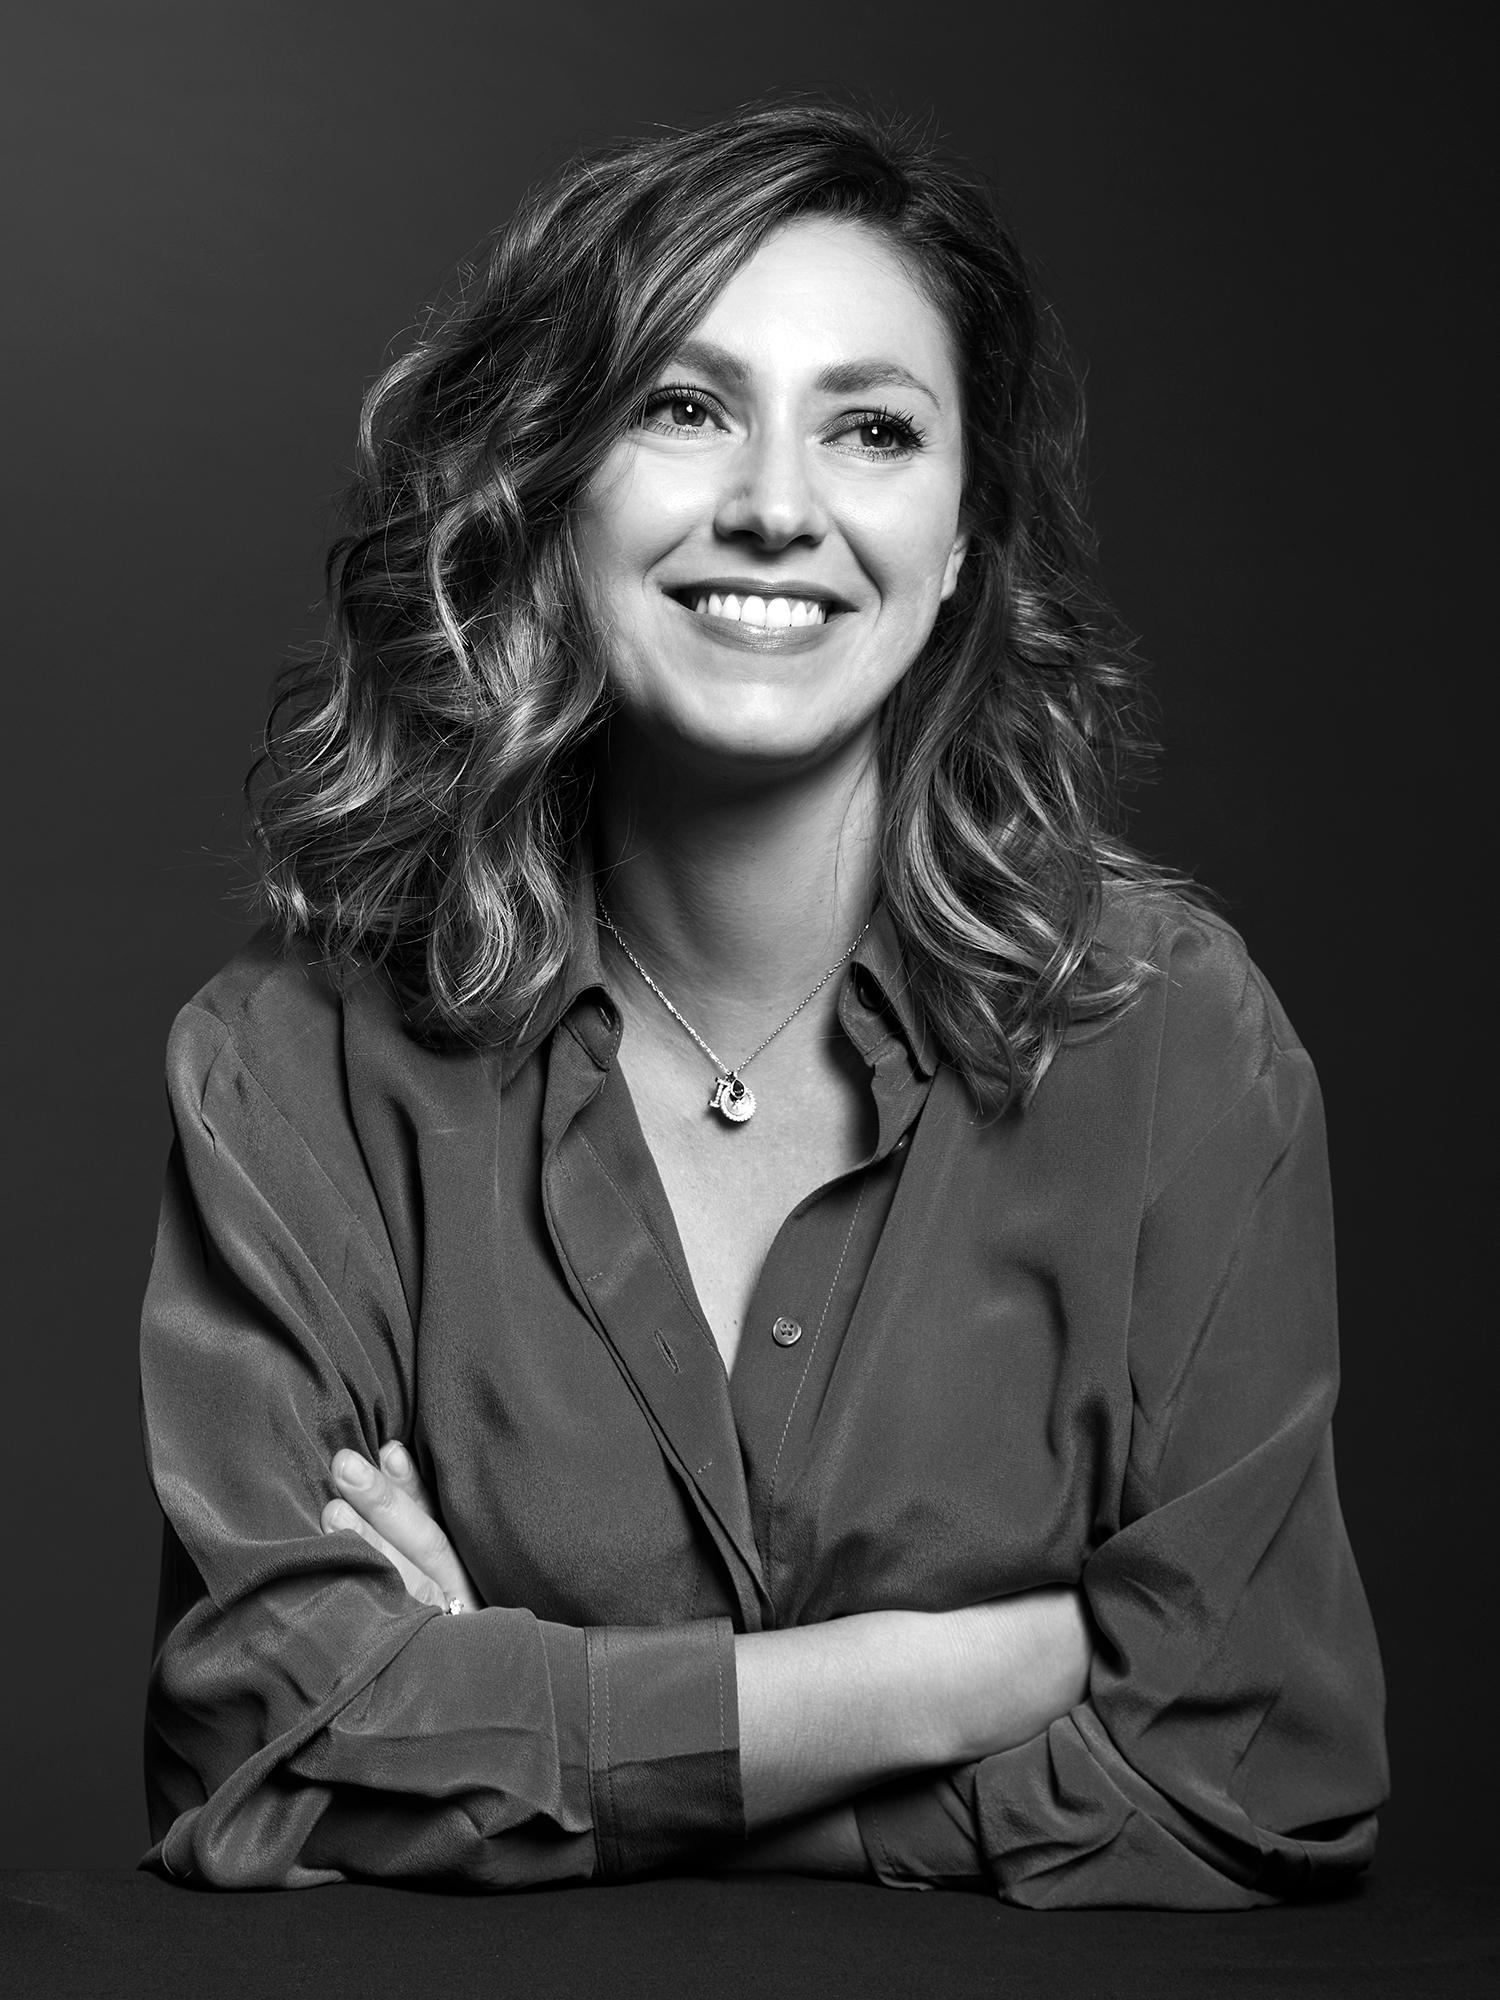 Valeria Palombini, Glasford International Italy